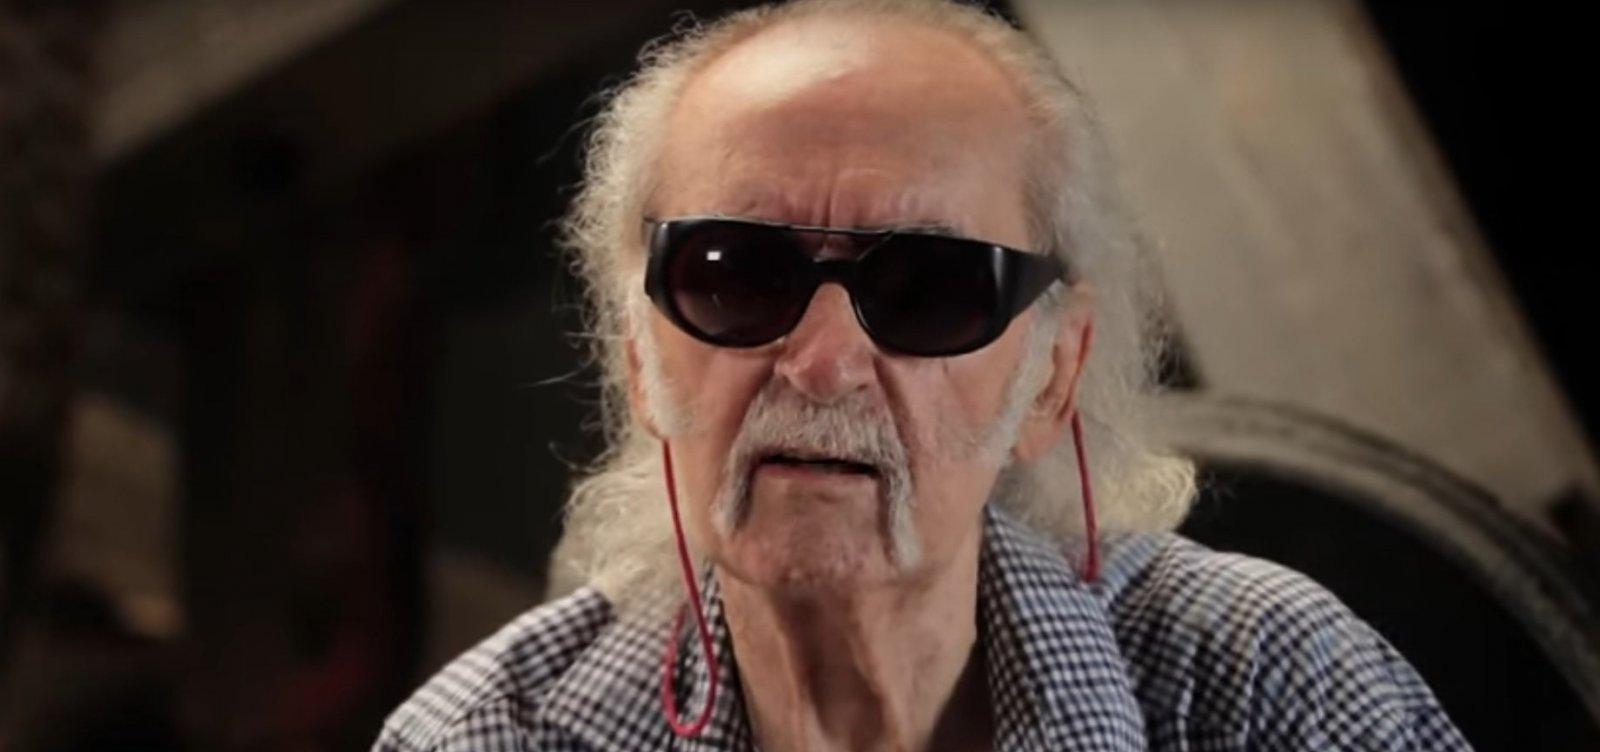 [Morre Mário Cravo Jr., o maior escultor baiano, aos 95 anos]